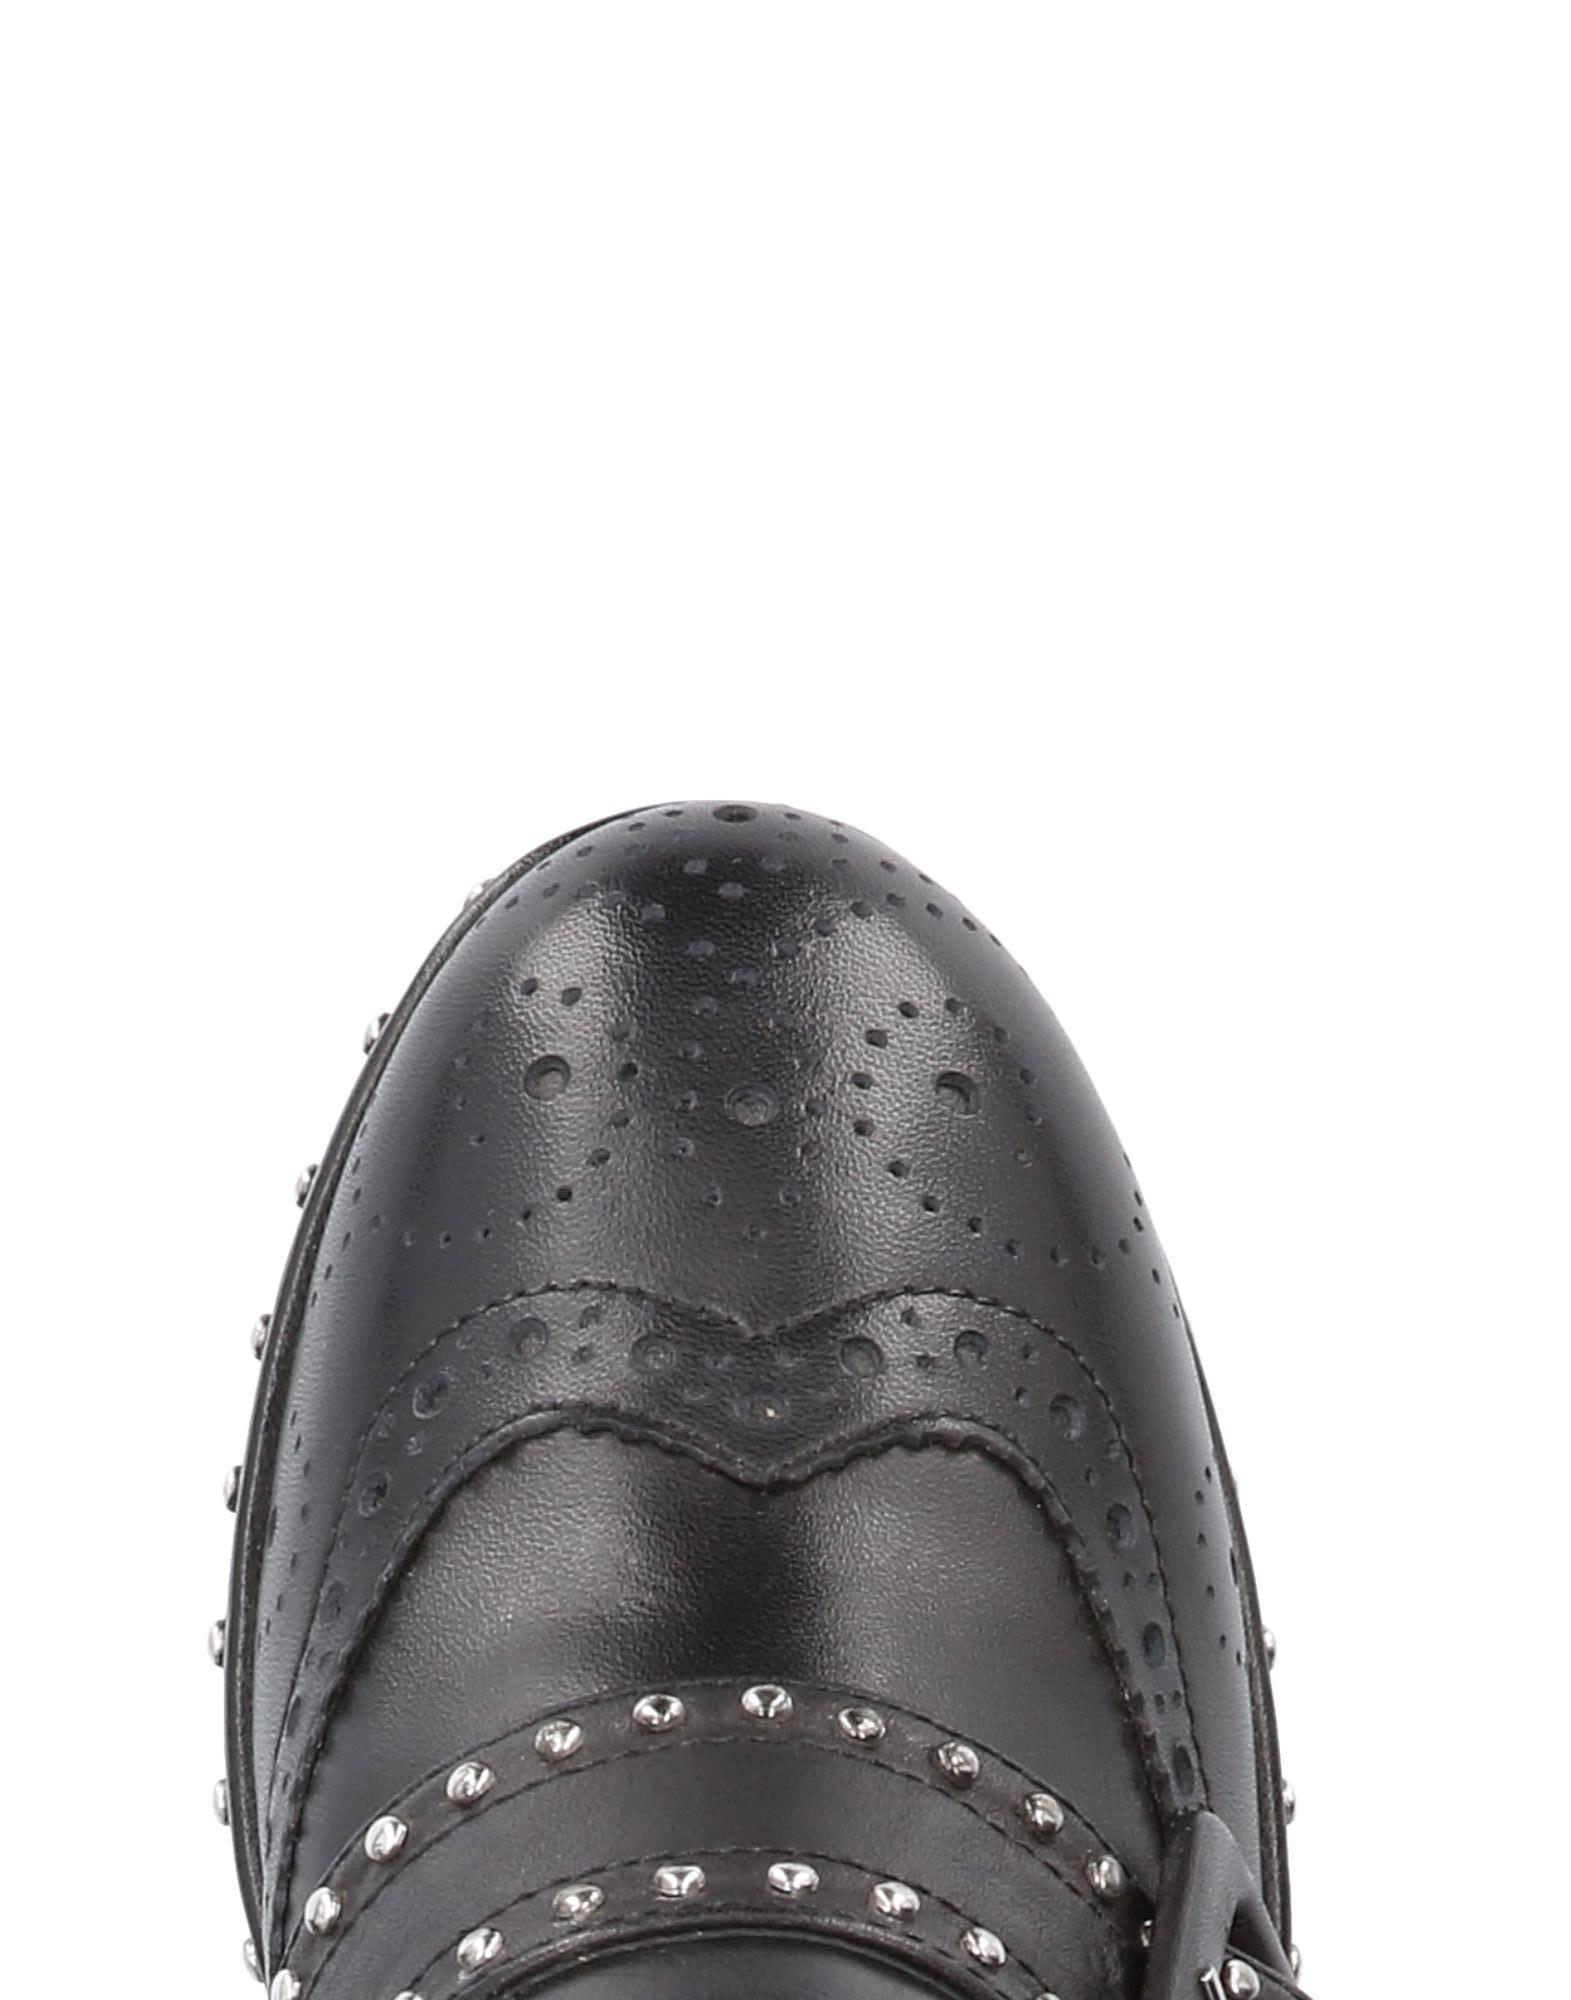 Bruno Premi Gute Mokassins Damen  11455800DL Gute Premi Qualität beliebte Schuhe 27ab3e